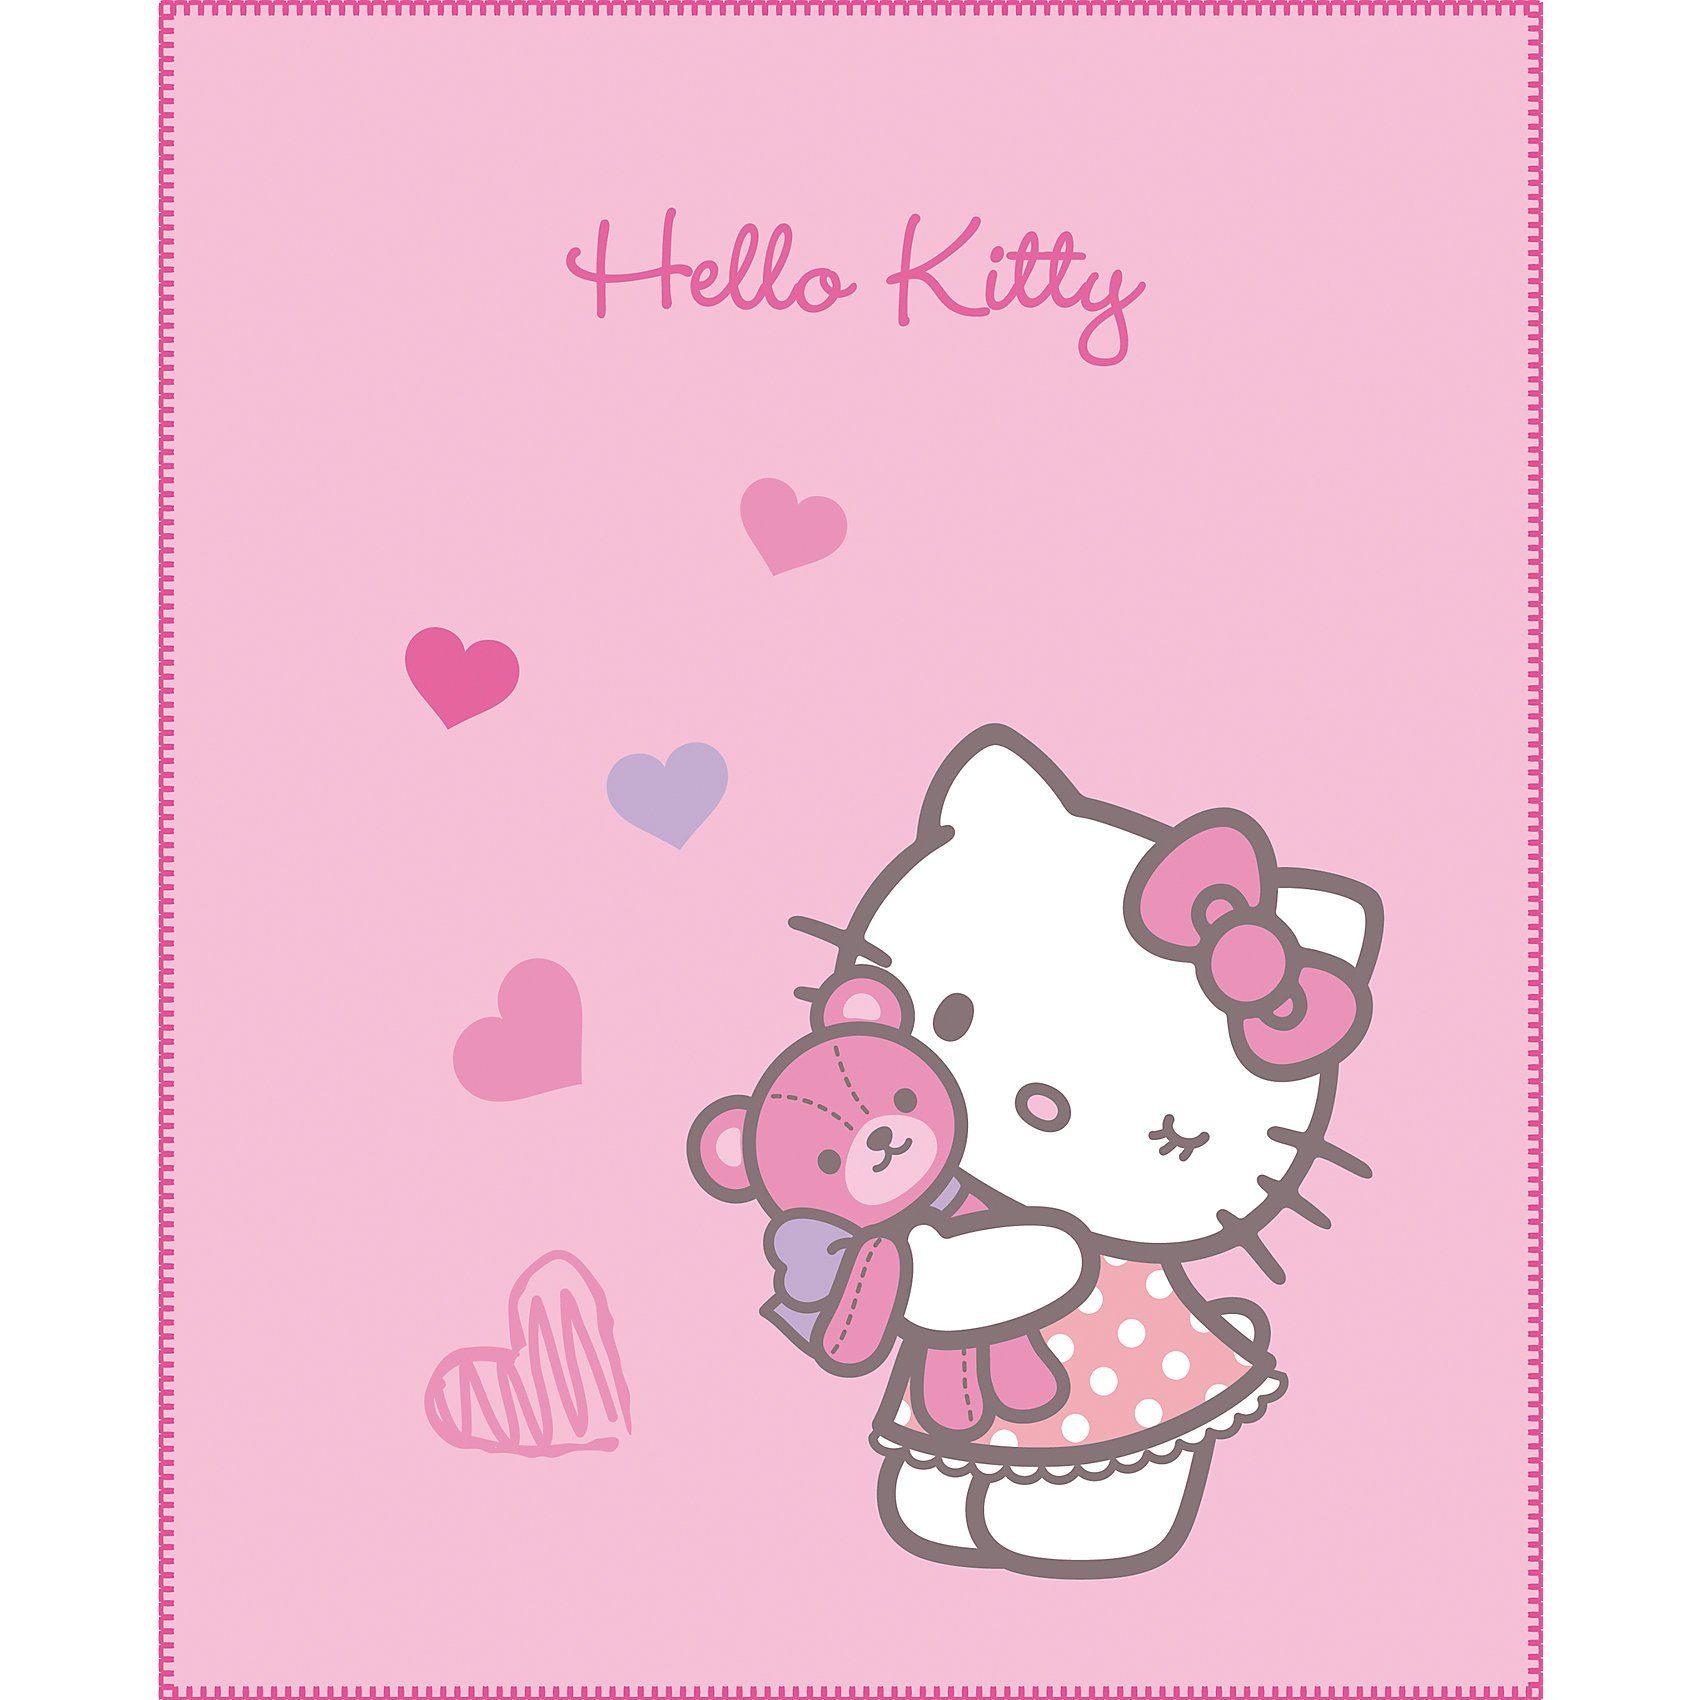 CTI Kuscheldecke Hello Kitty, Mimi Love Pink, 110 x 140 cm